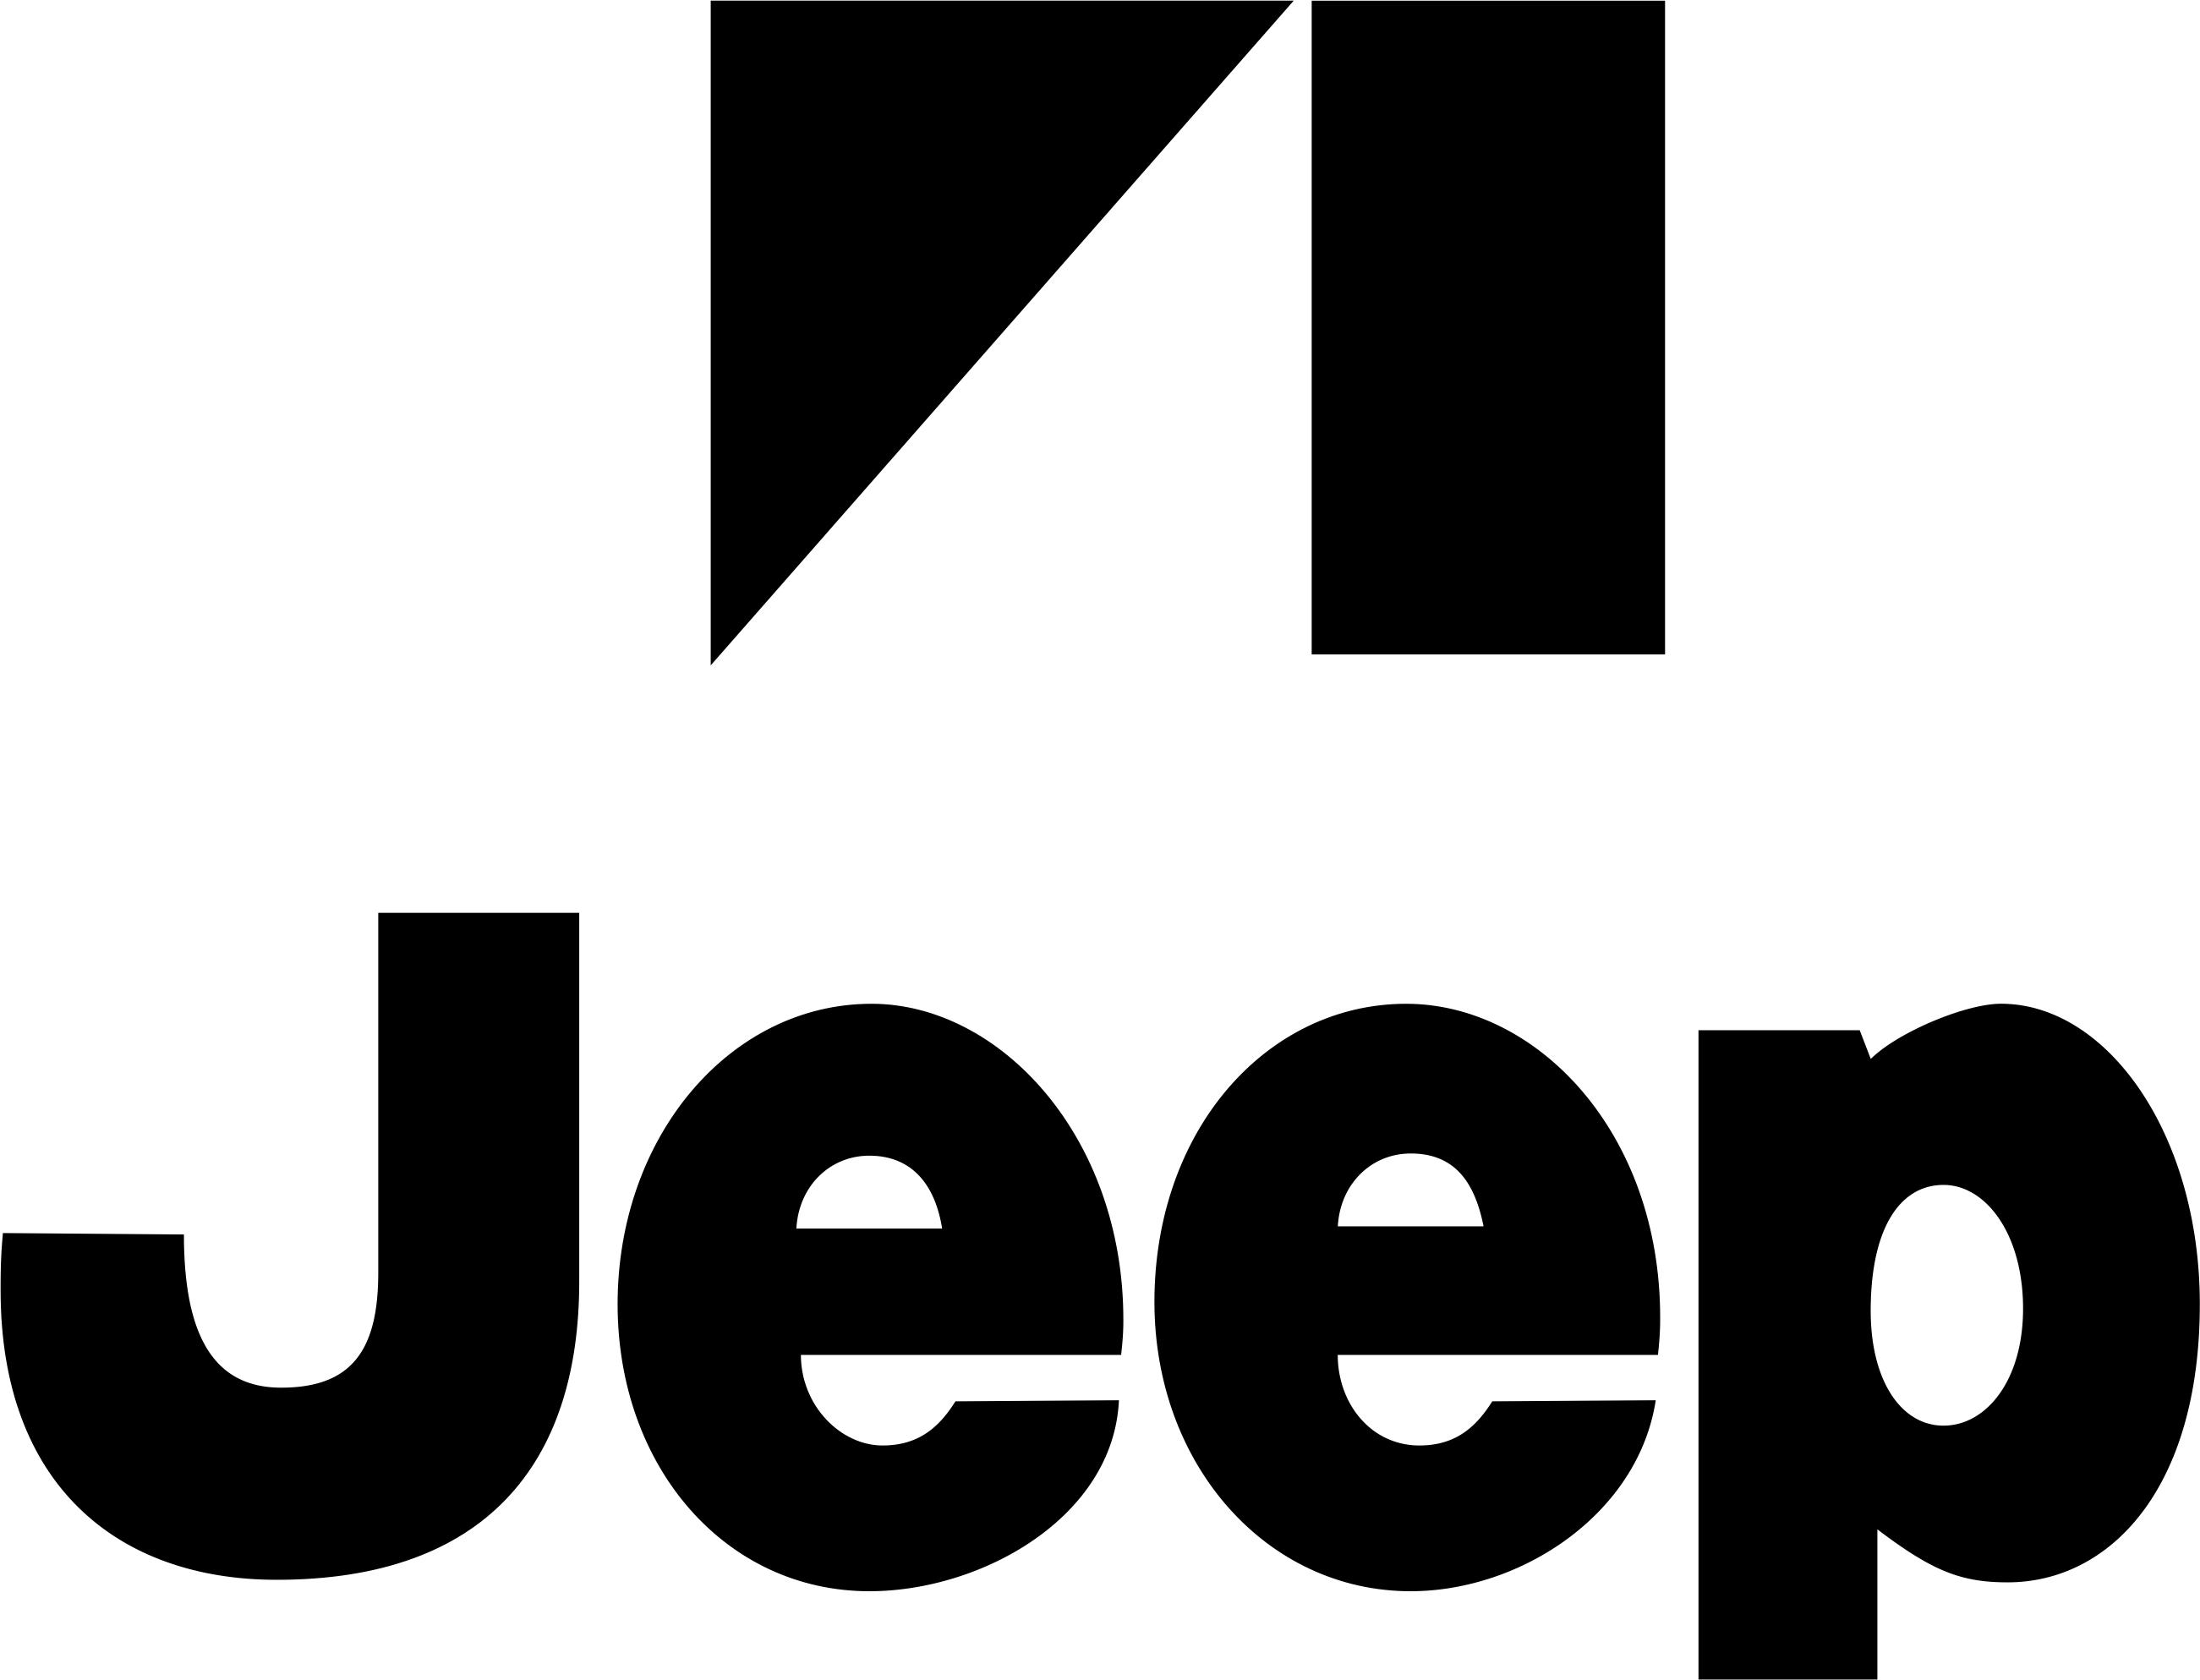 Jeep logo vector art Free Vector cdr Download - 3axis.co